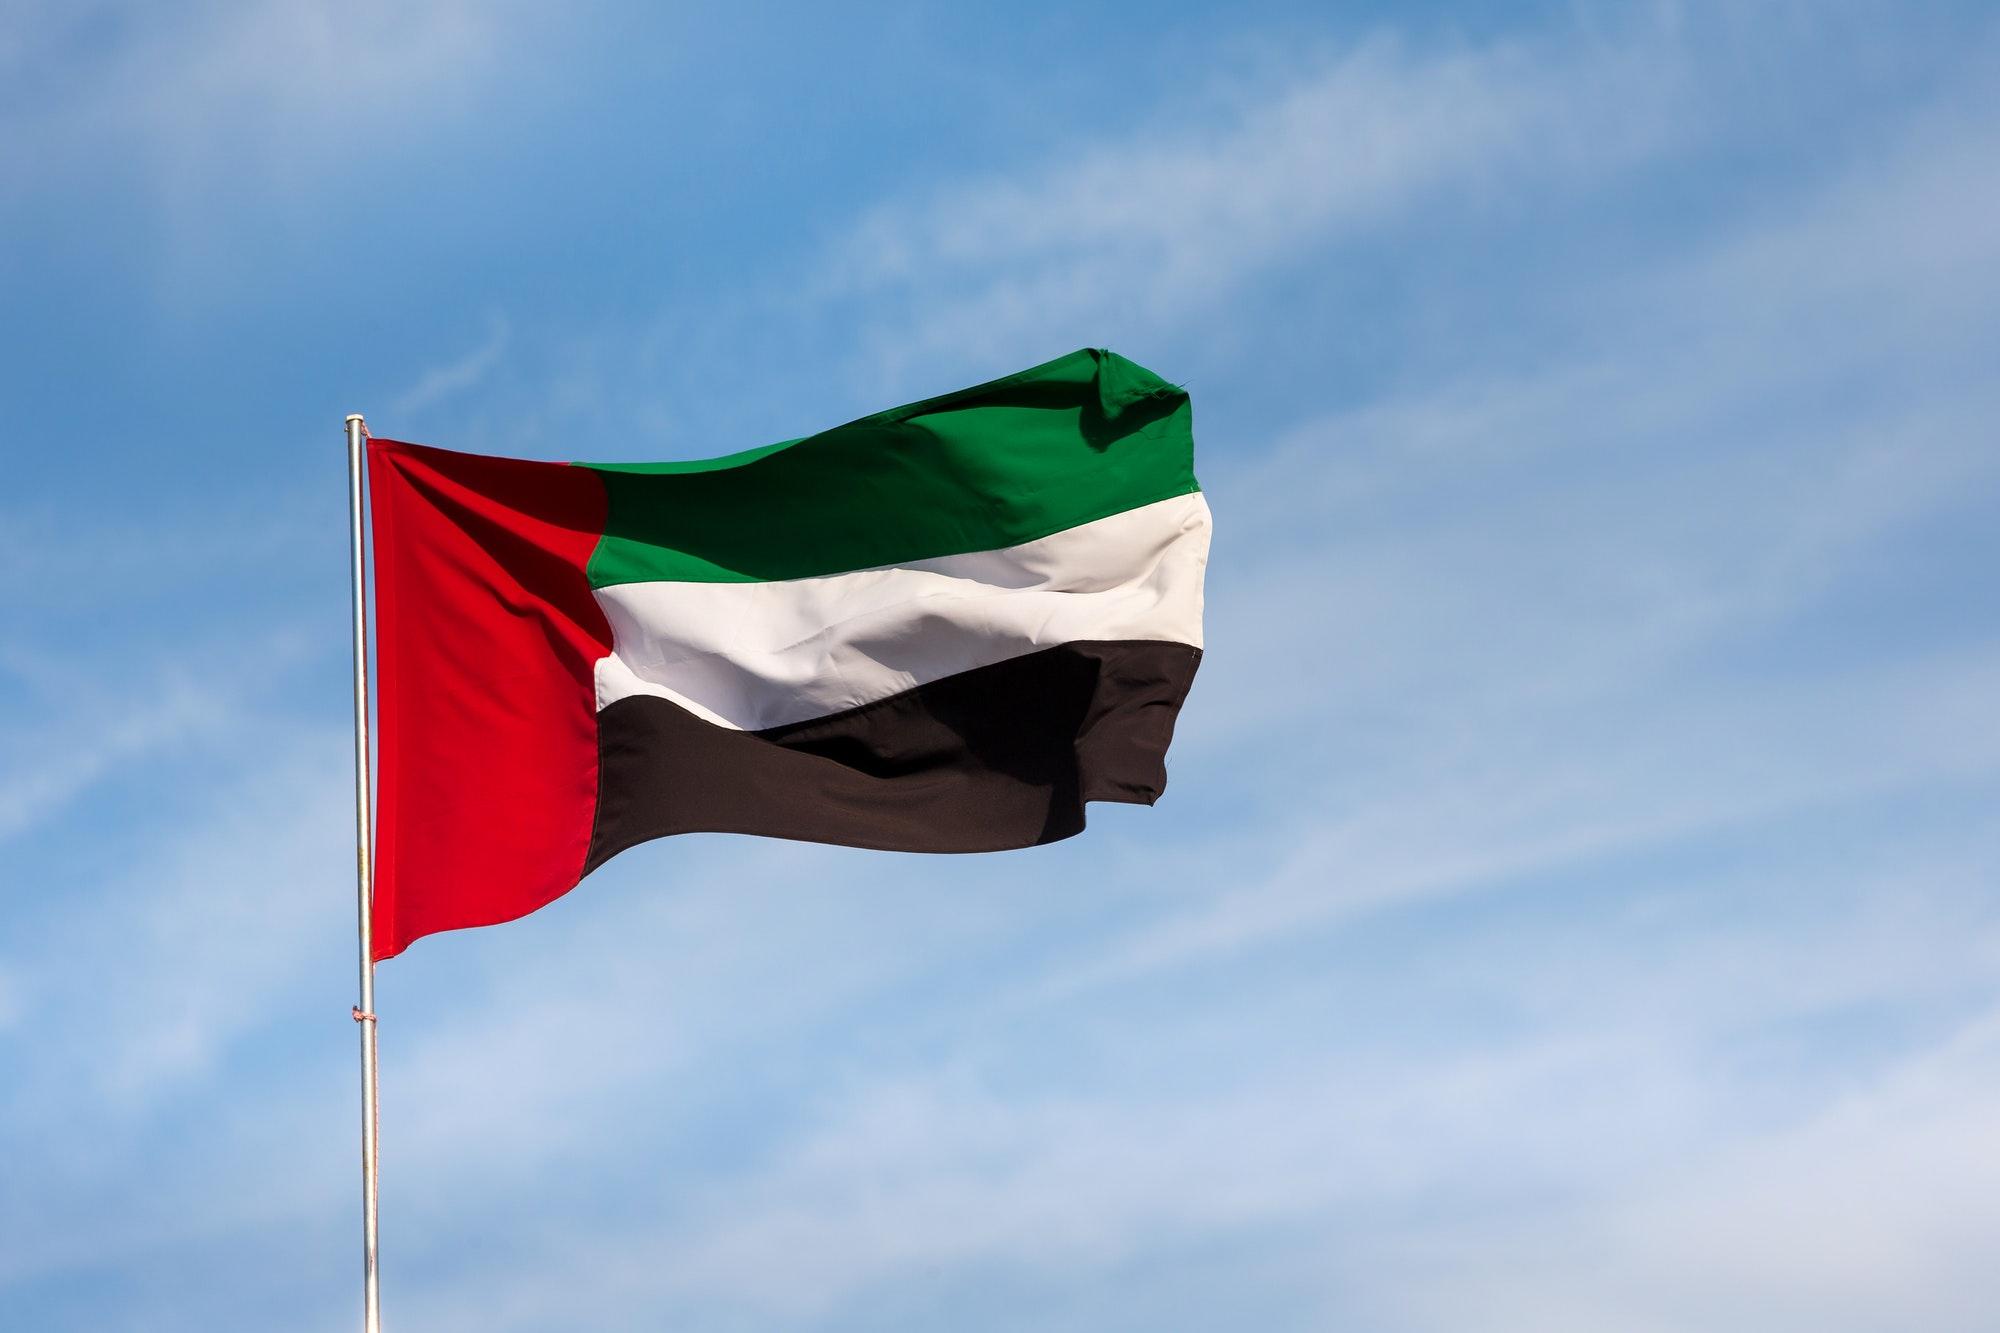 UAE flag waving in the sky, national symbol of UAE. UAE National day. UAE flag day.